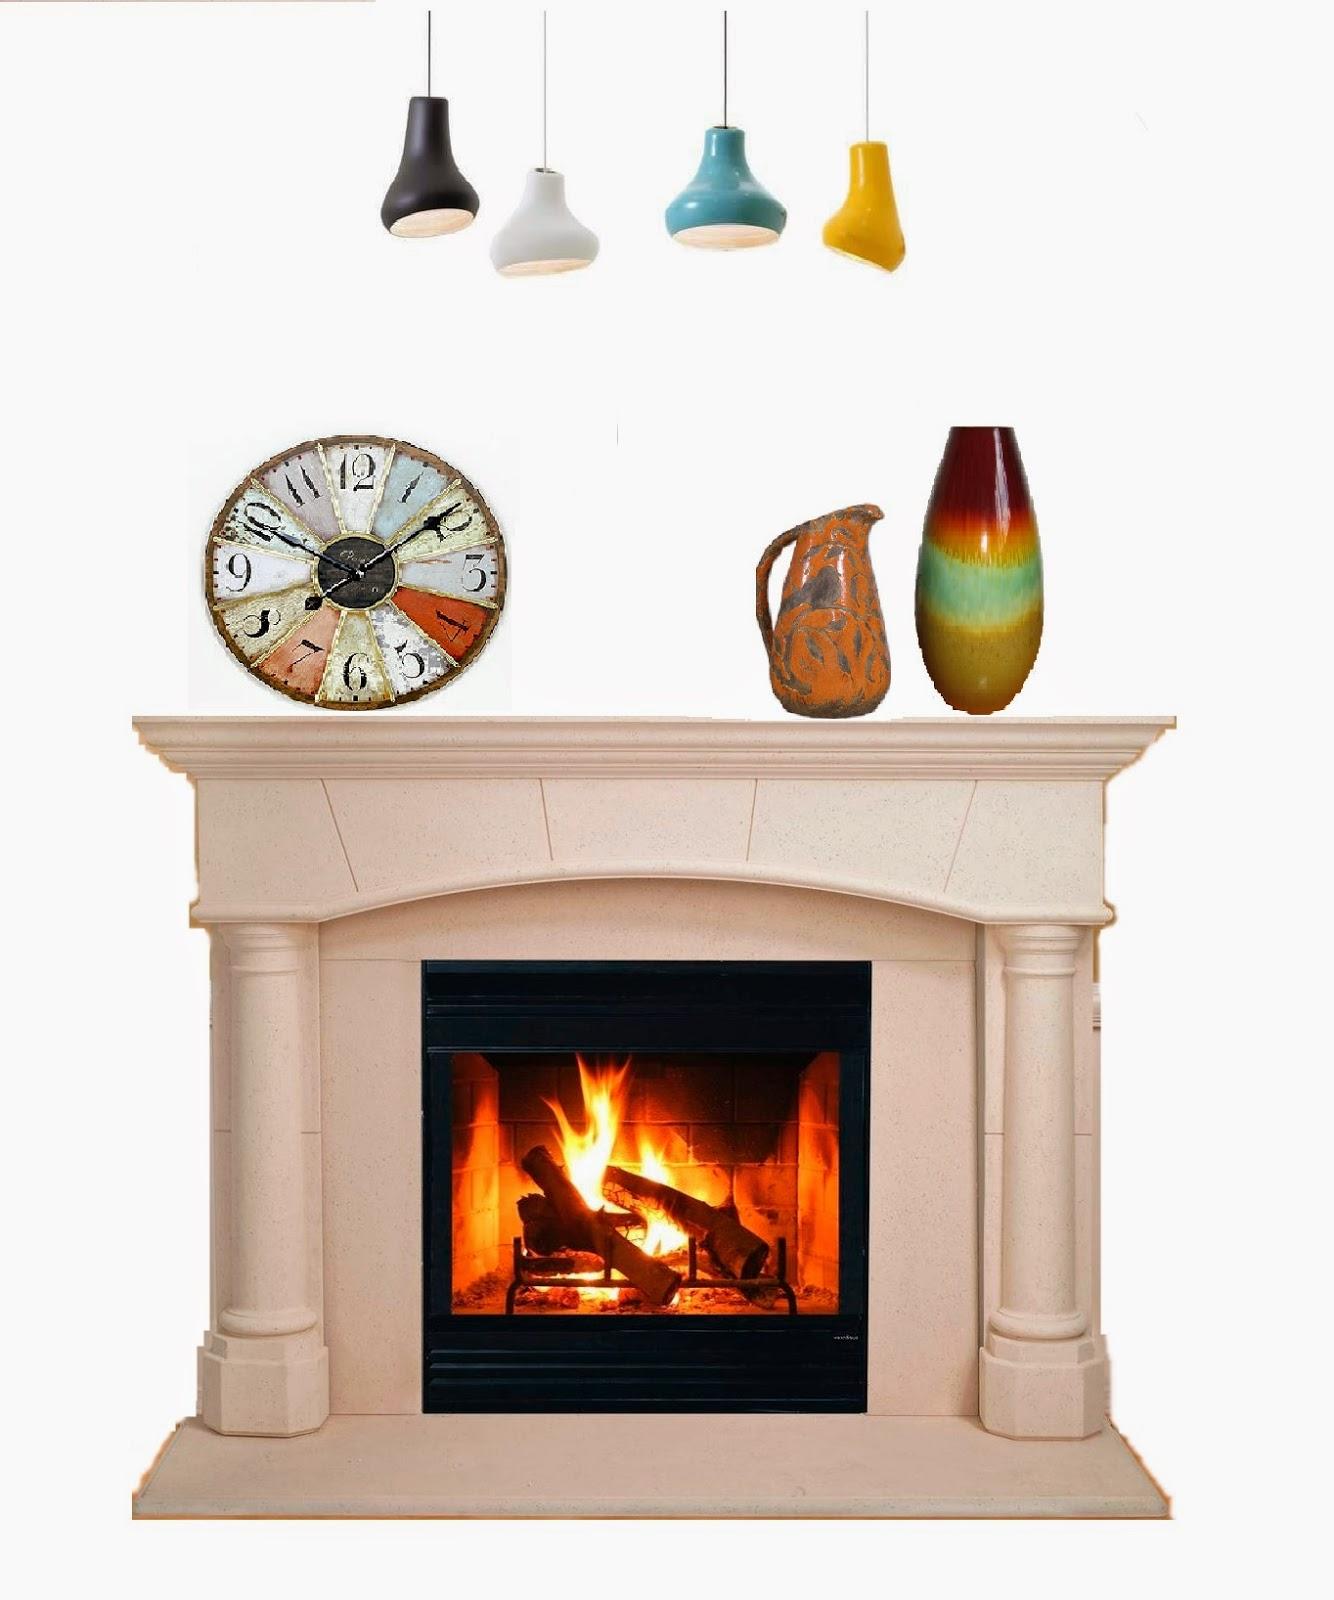 mantel on fireplace decorations